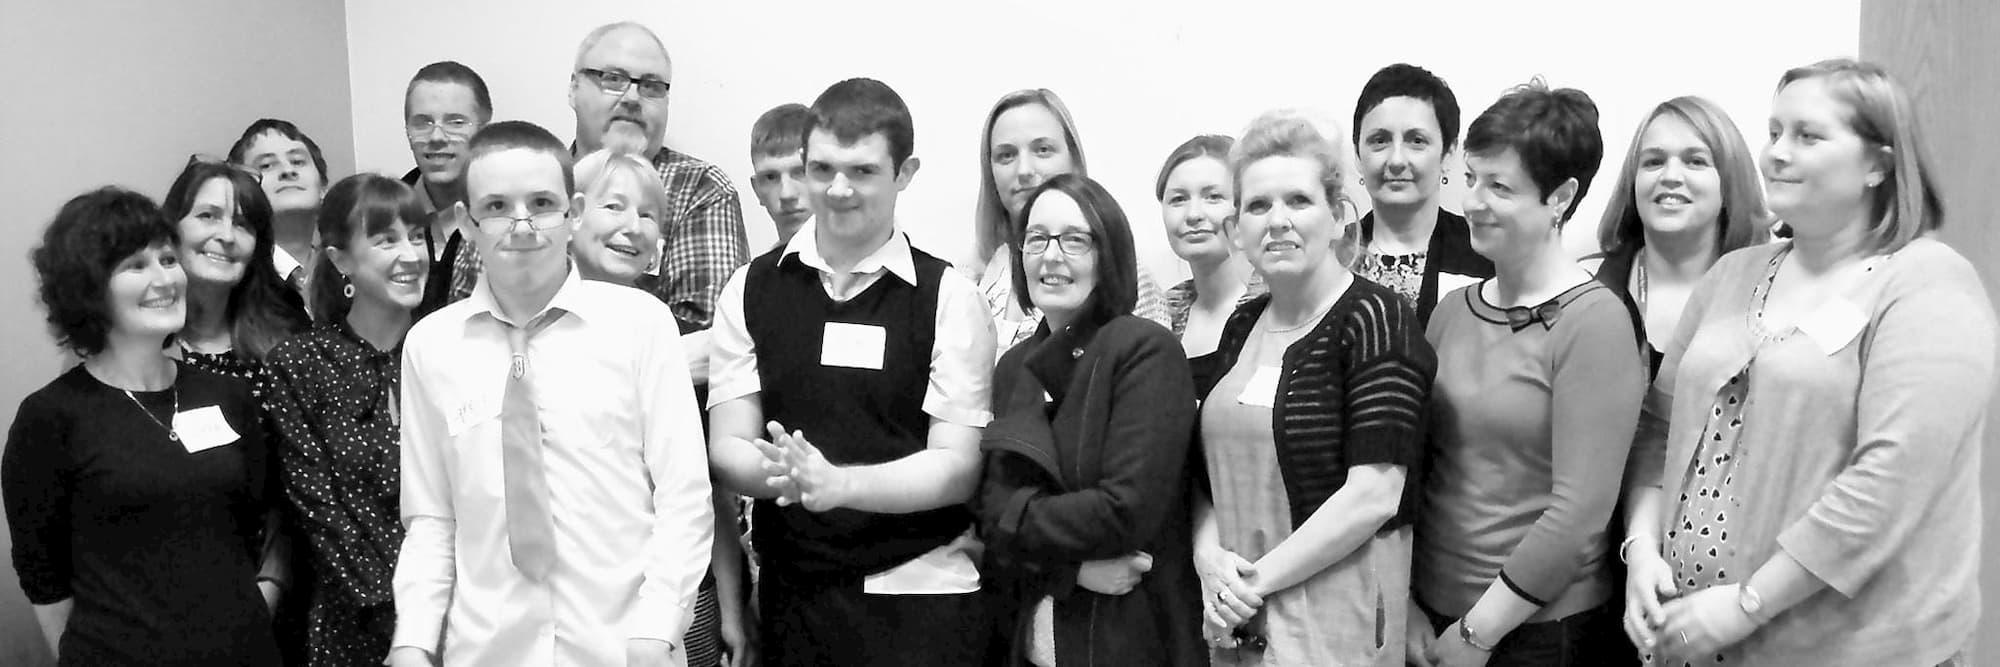 Glasgow school leavers co-design team group photo